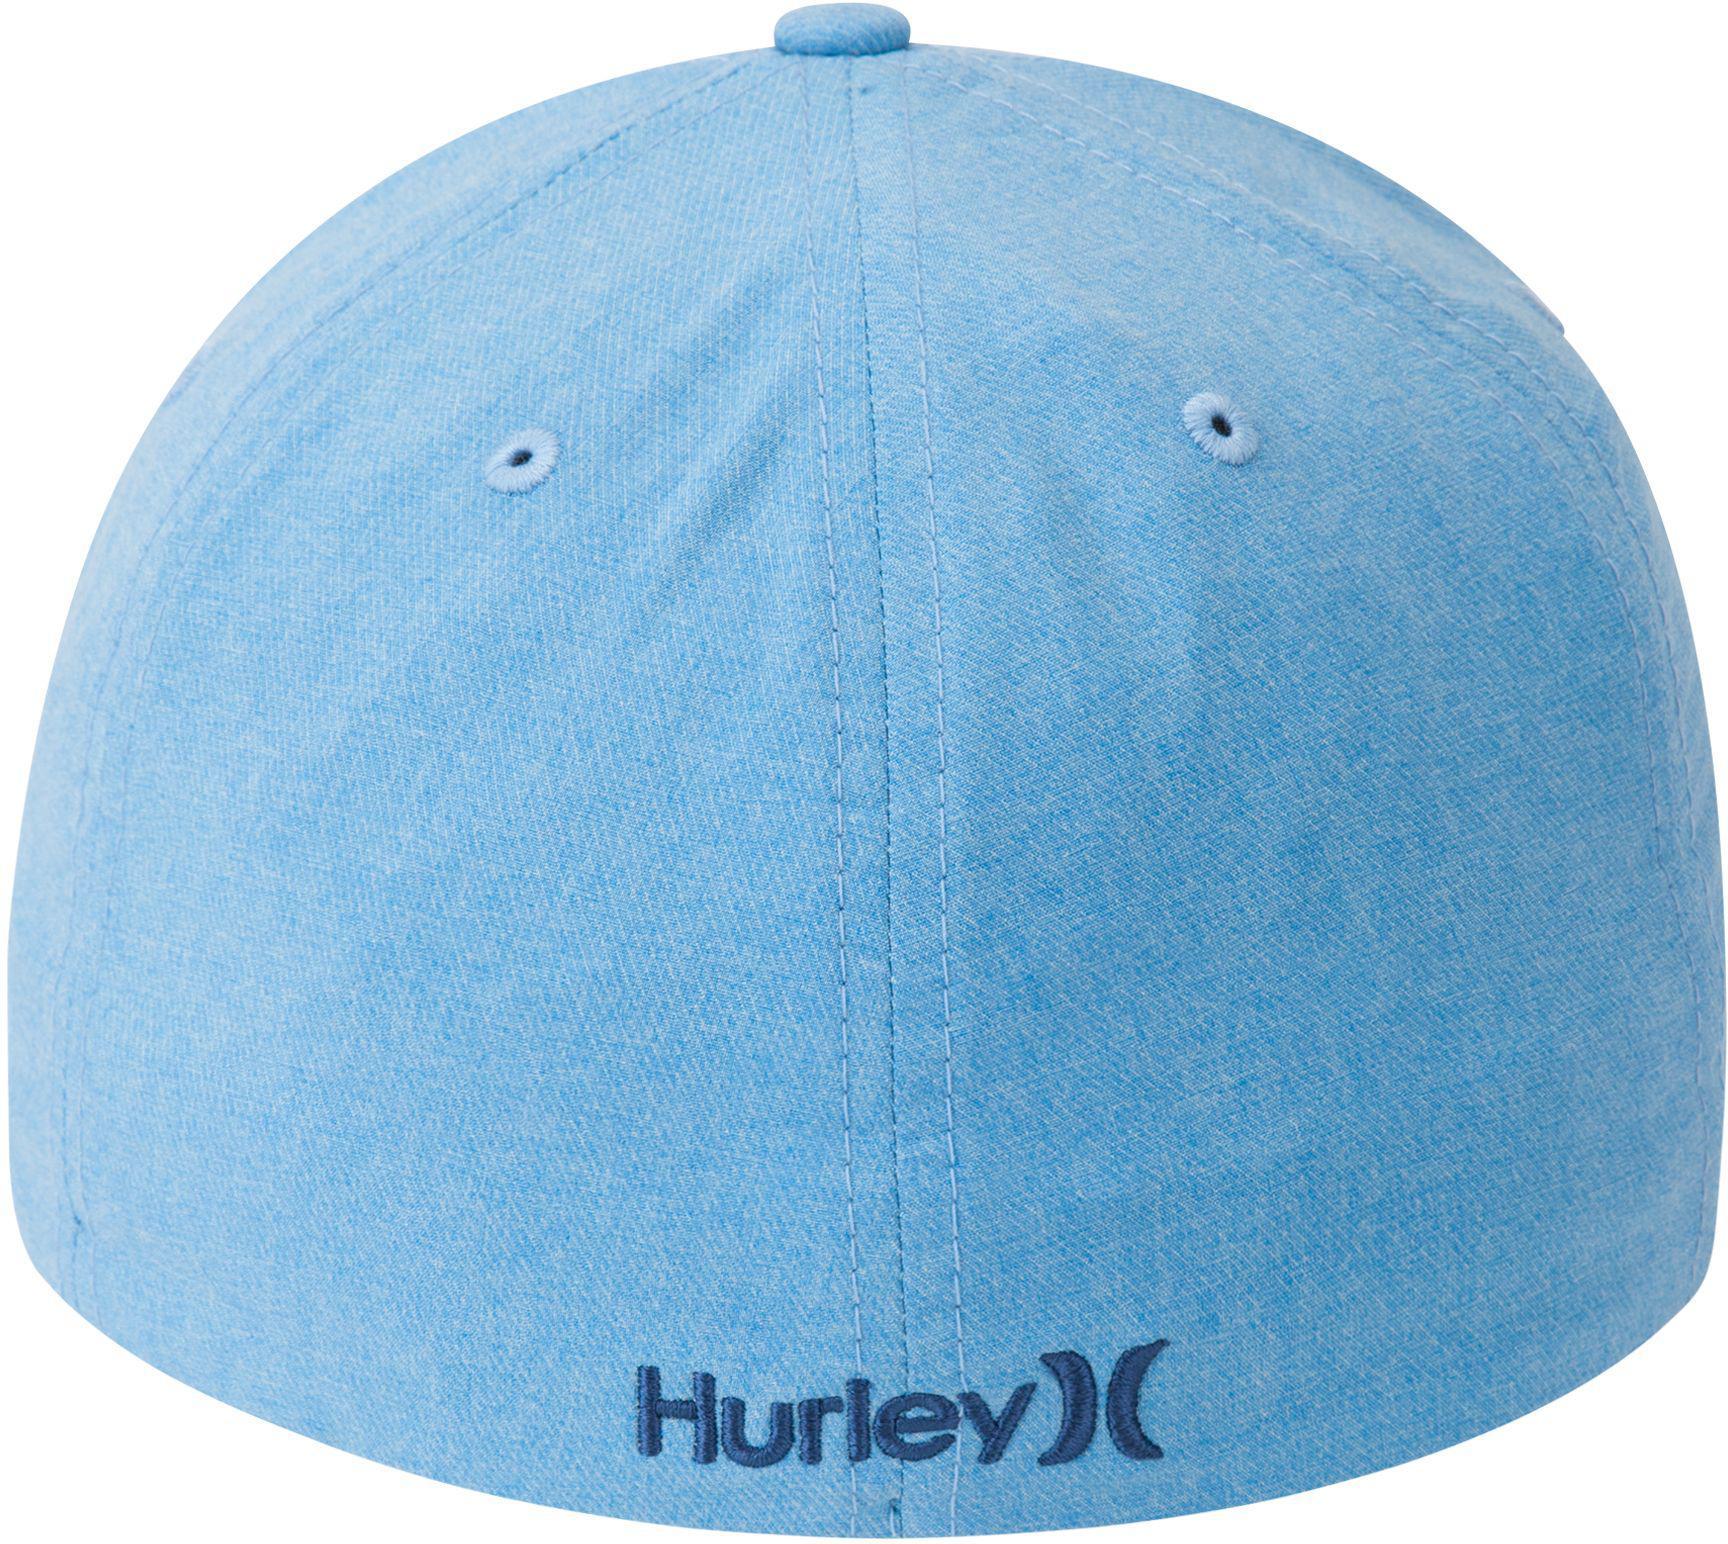 premium selection 8d5fa 25f83 Hurley Dri-fit Heather Flexfit Hat in Blue for Men - Lyst